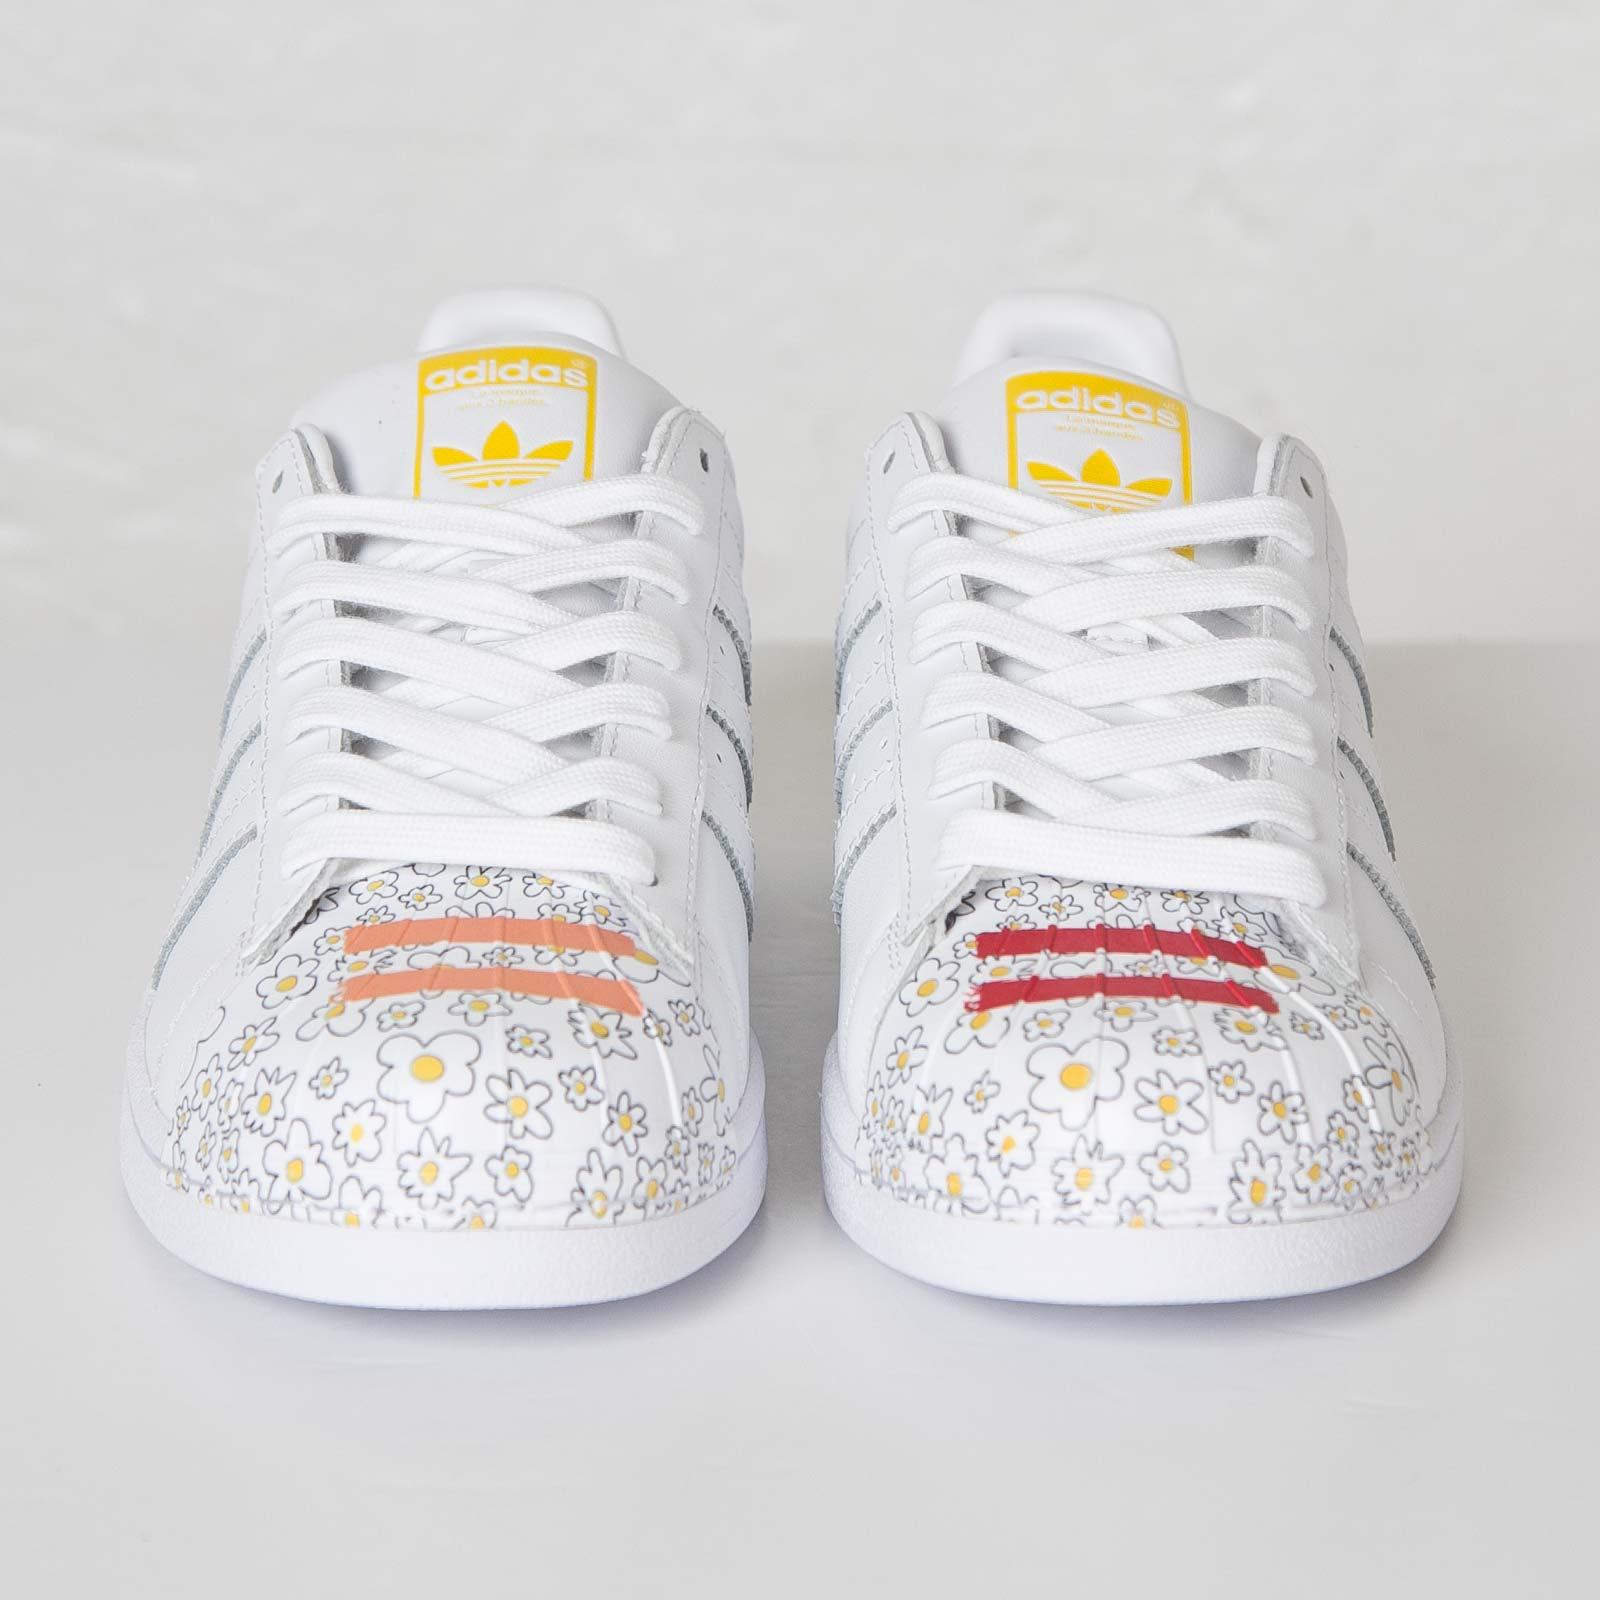 timeless design 34cf0 5e257 adidas Superstar Pharrell Supershell - S83368 - Sneakersnstuff   sneakers    streetwear online since 1999